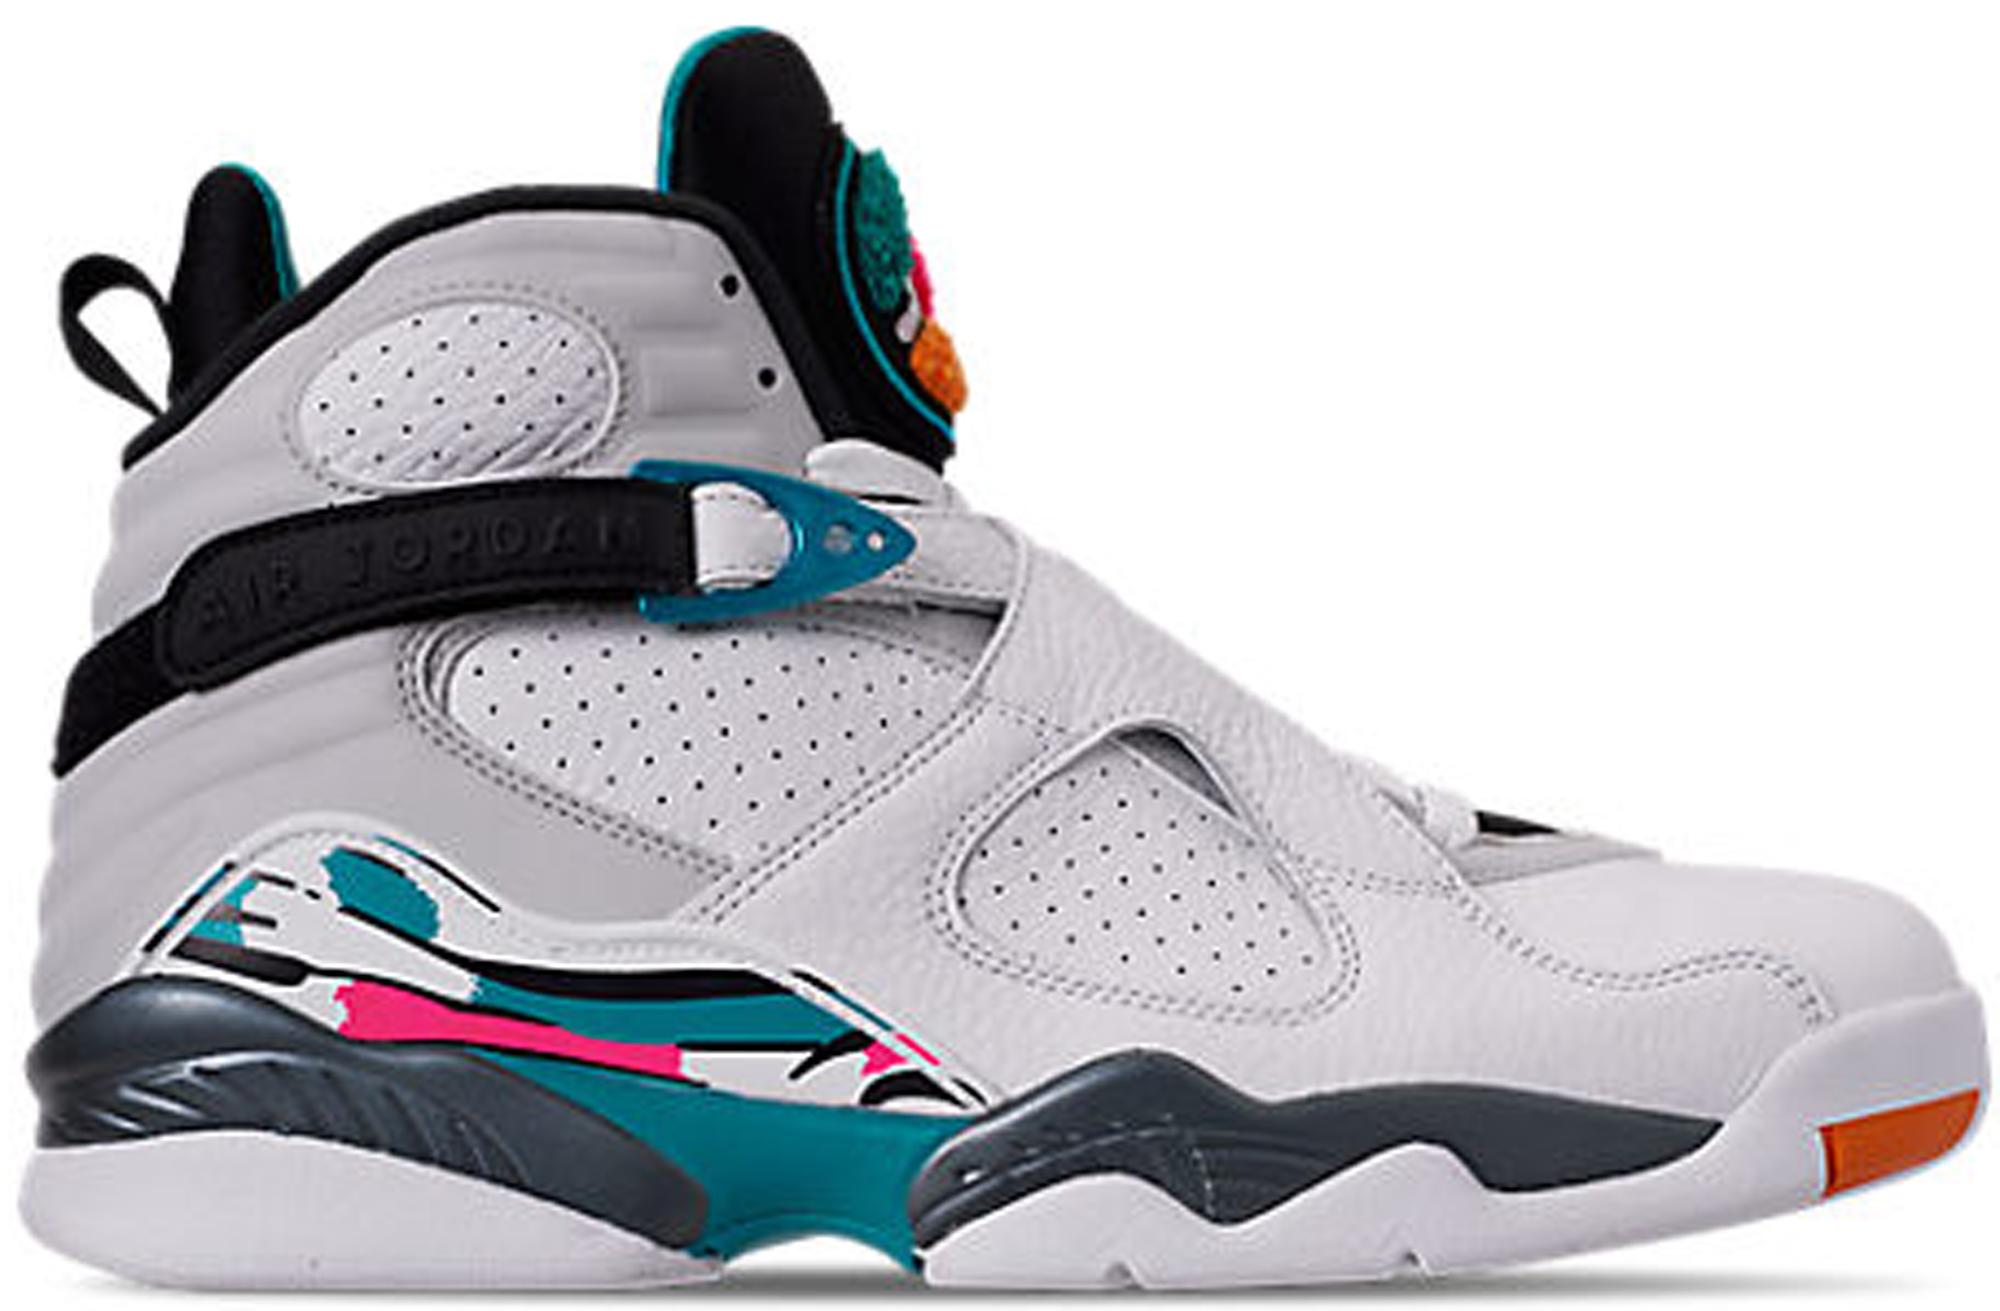 Jordan 8 Retro South Beach